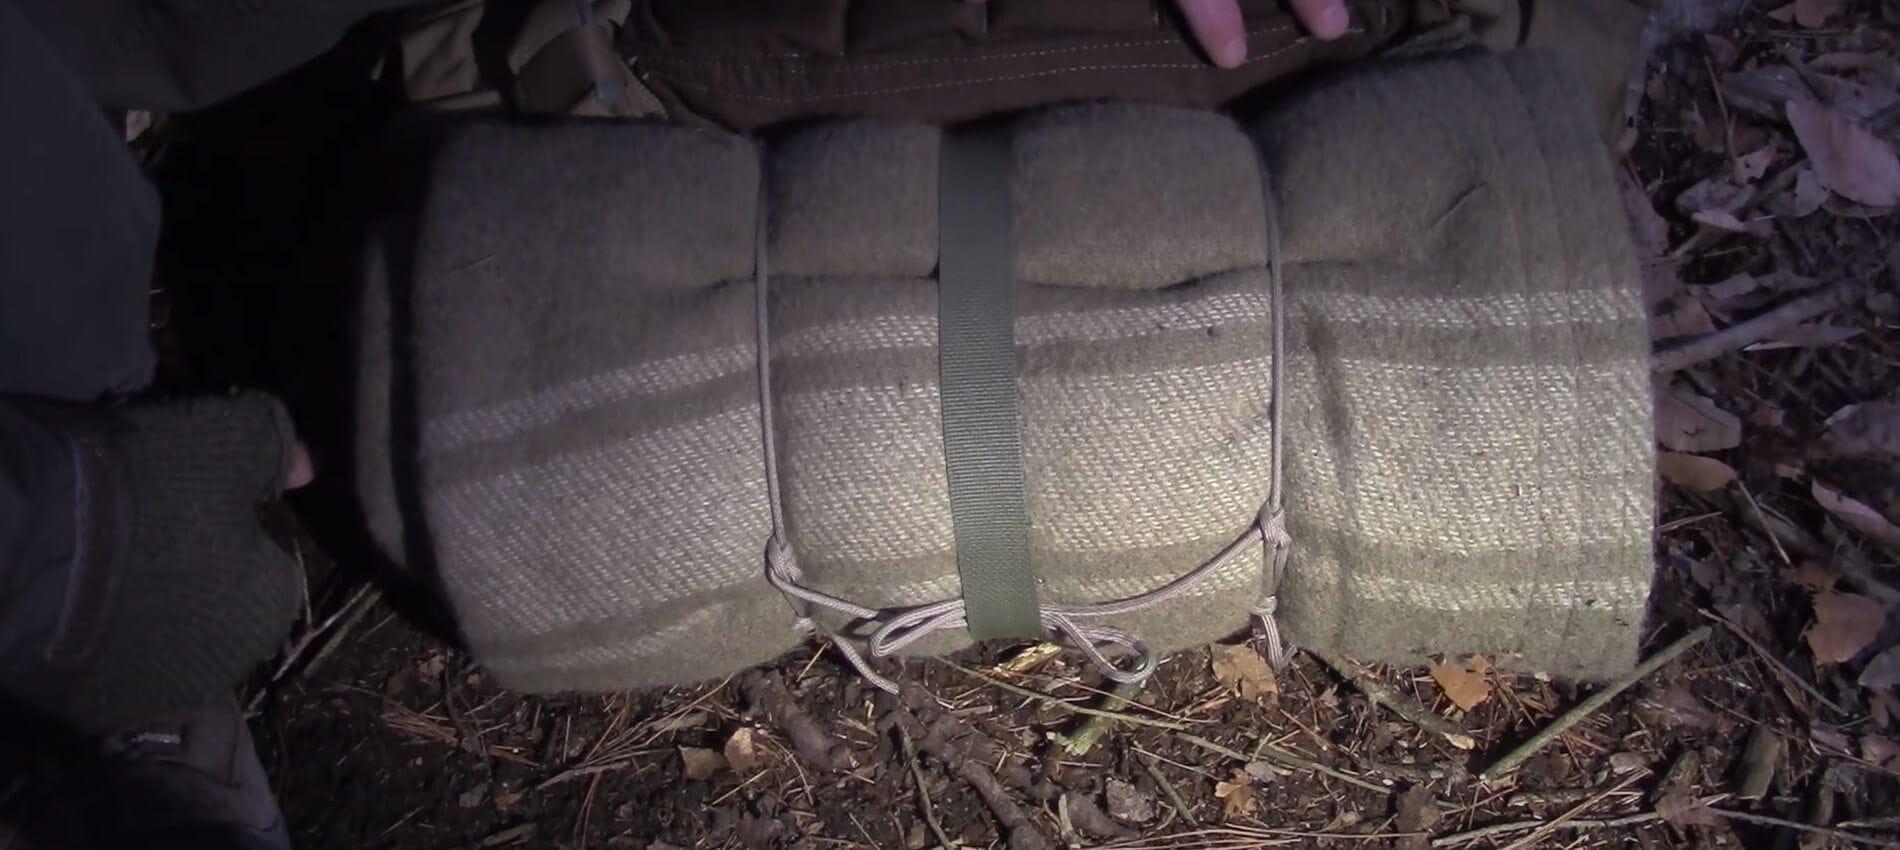 Sleeping blanket bag tied and rolled